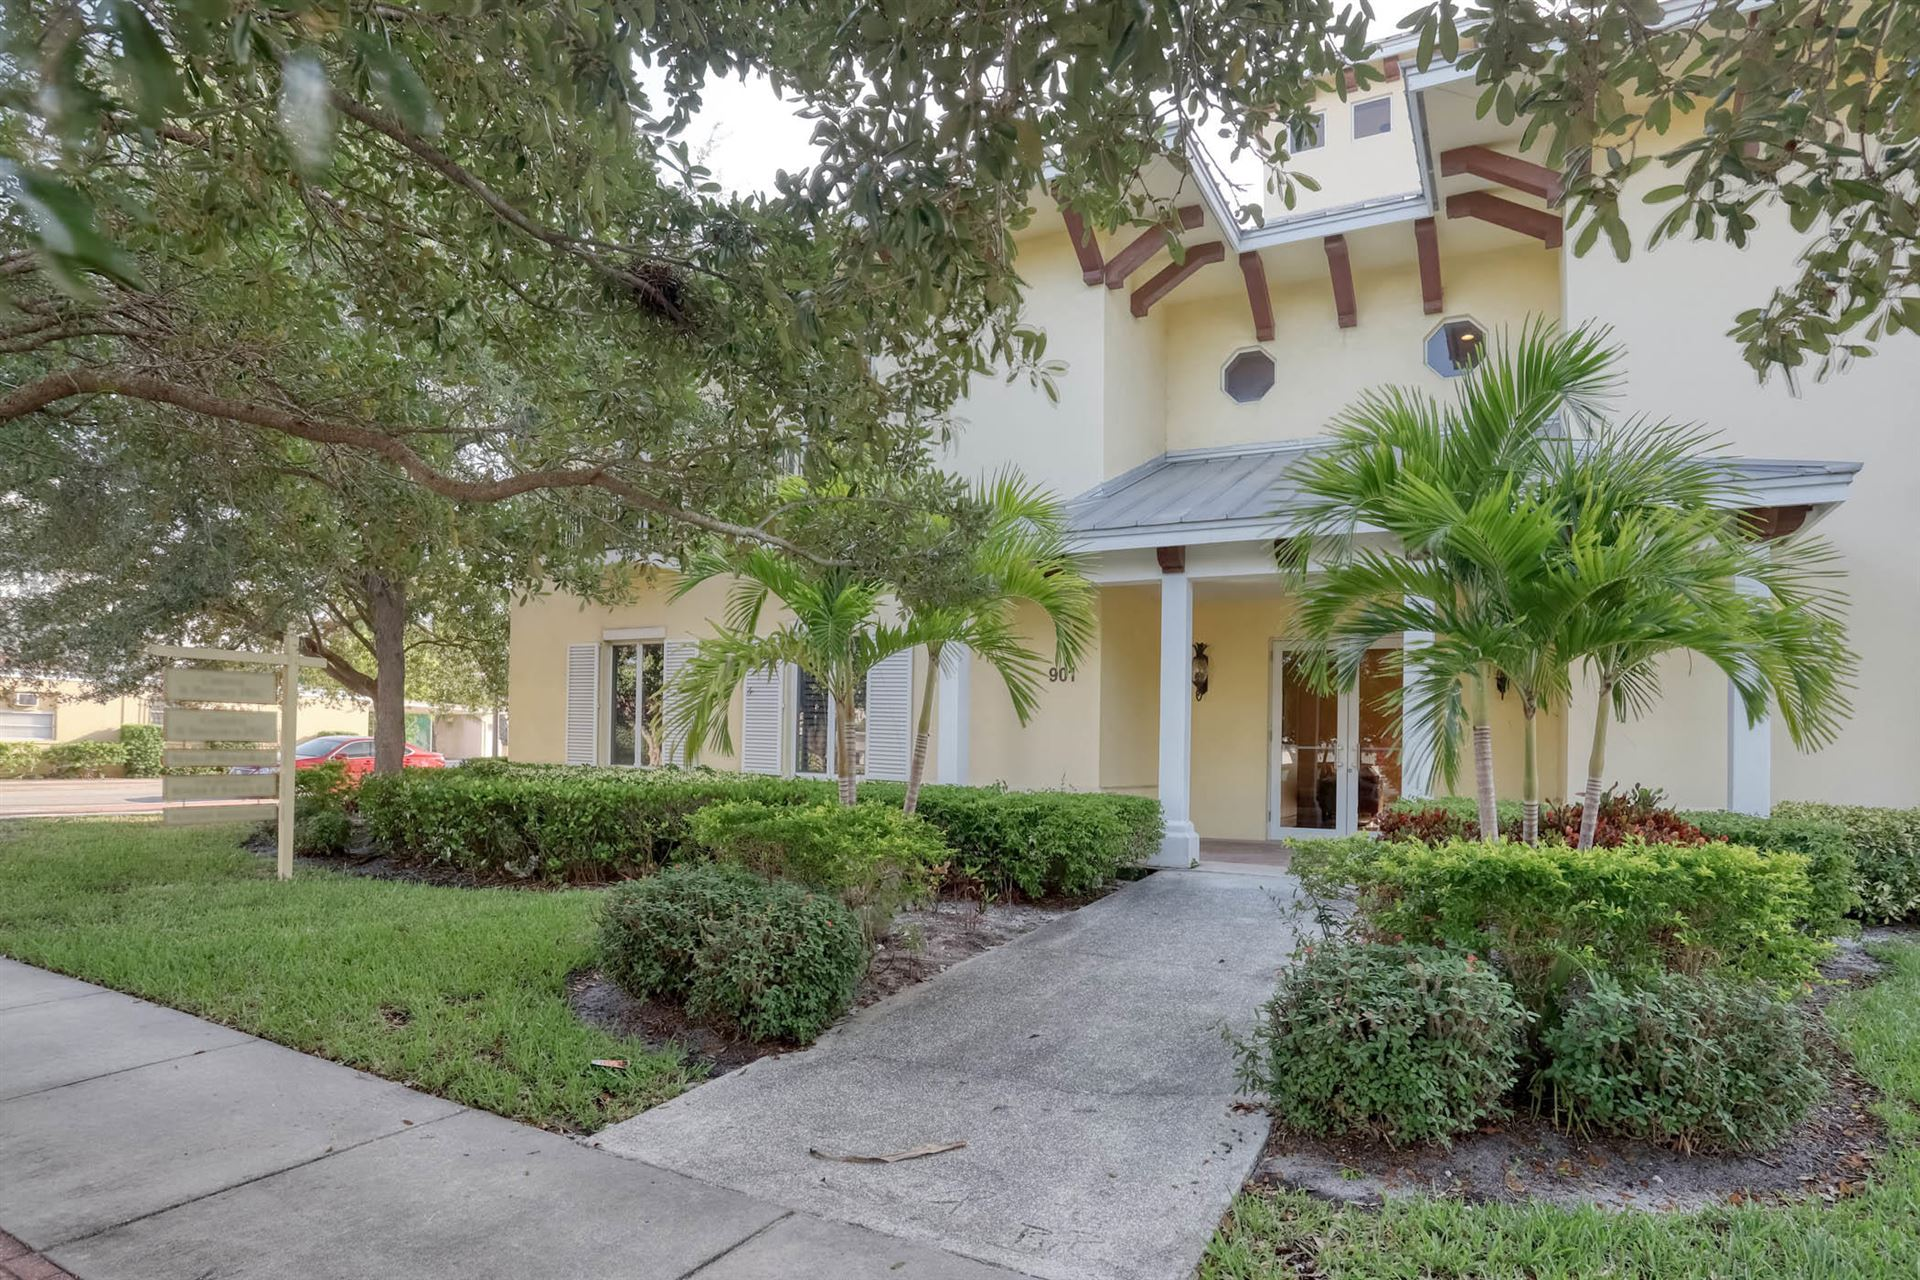 Photo of 901 N Olive Avenue, West Palm Beach, FL 33401 (MLS # RX-10629955)